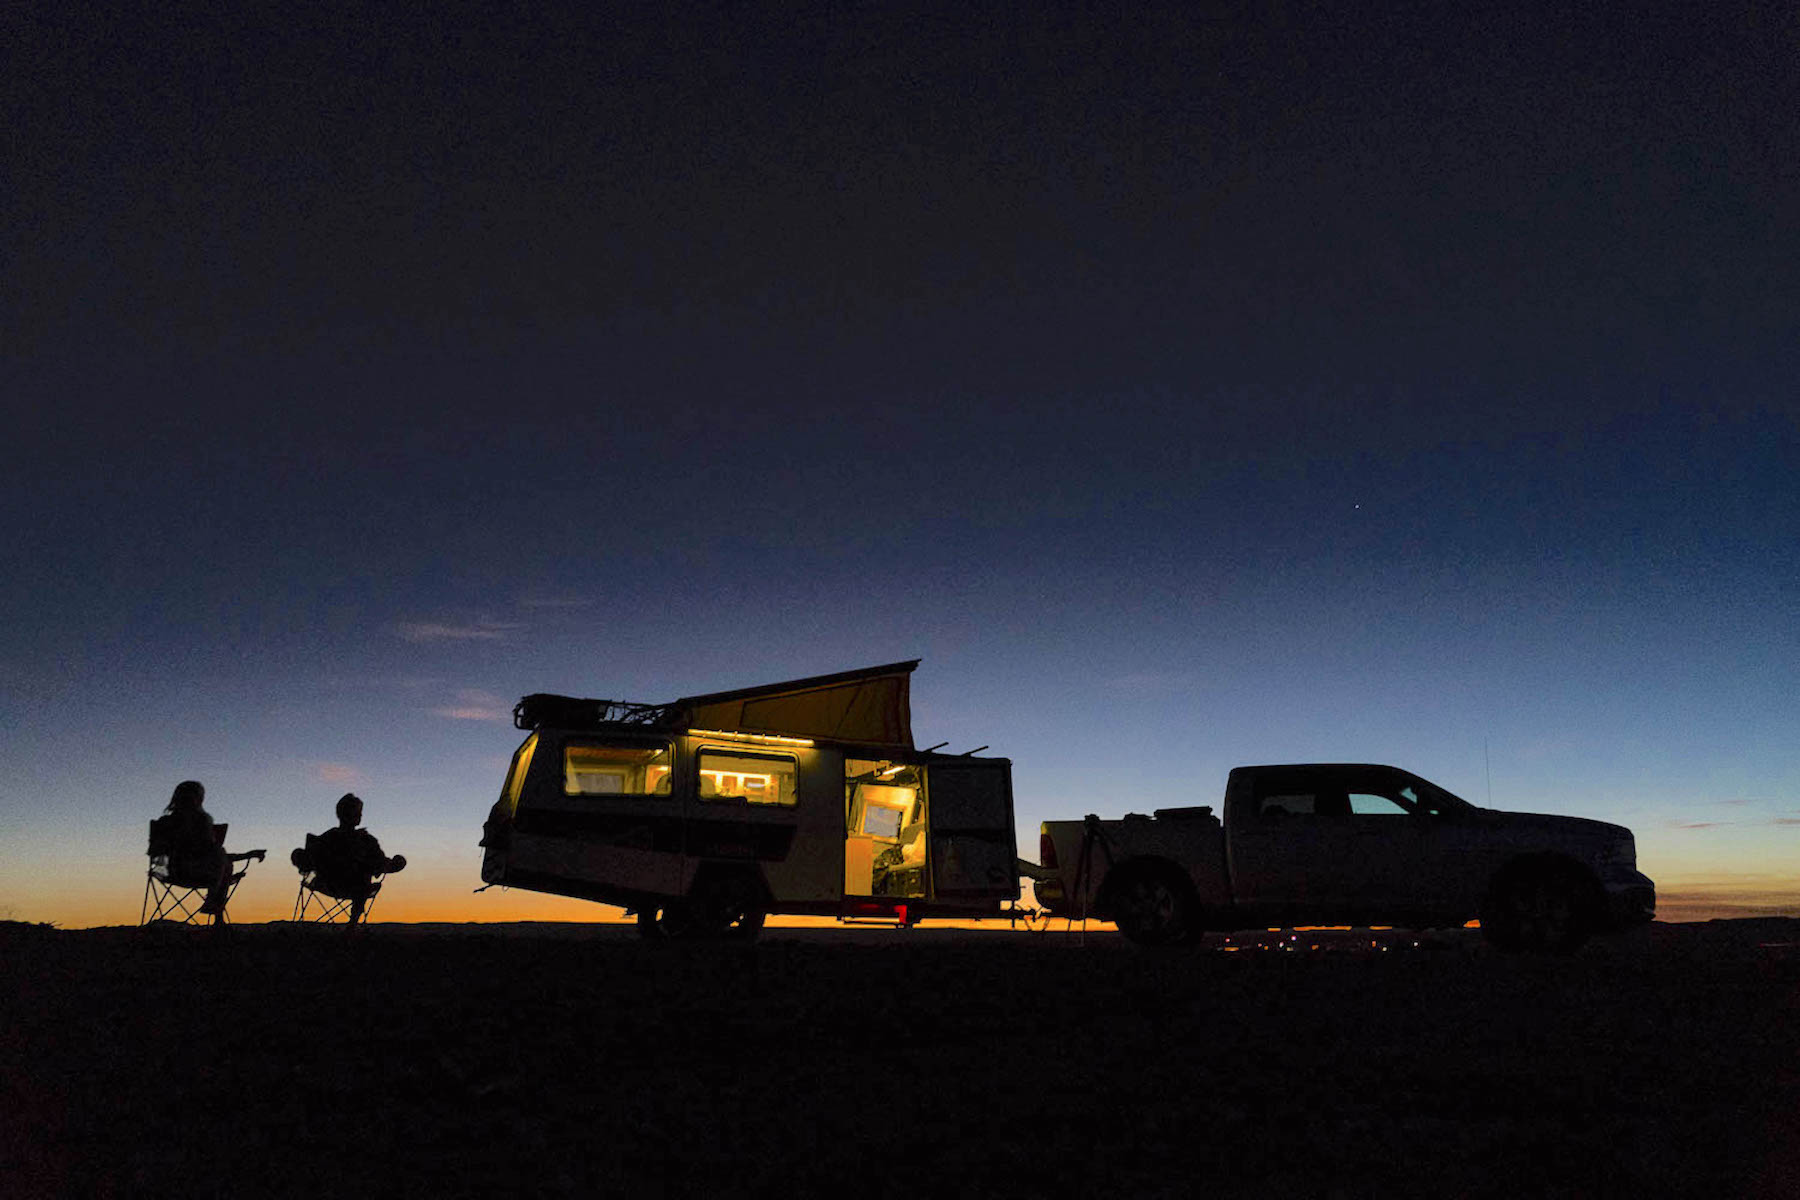 Taxa S Mantis Trailer Part 1 Rugged Portable Living